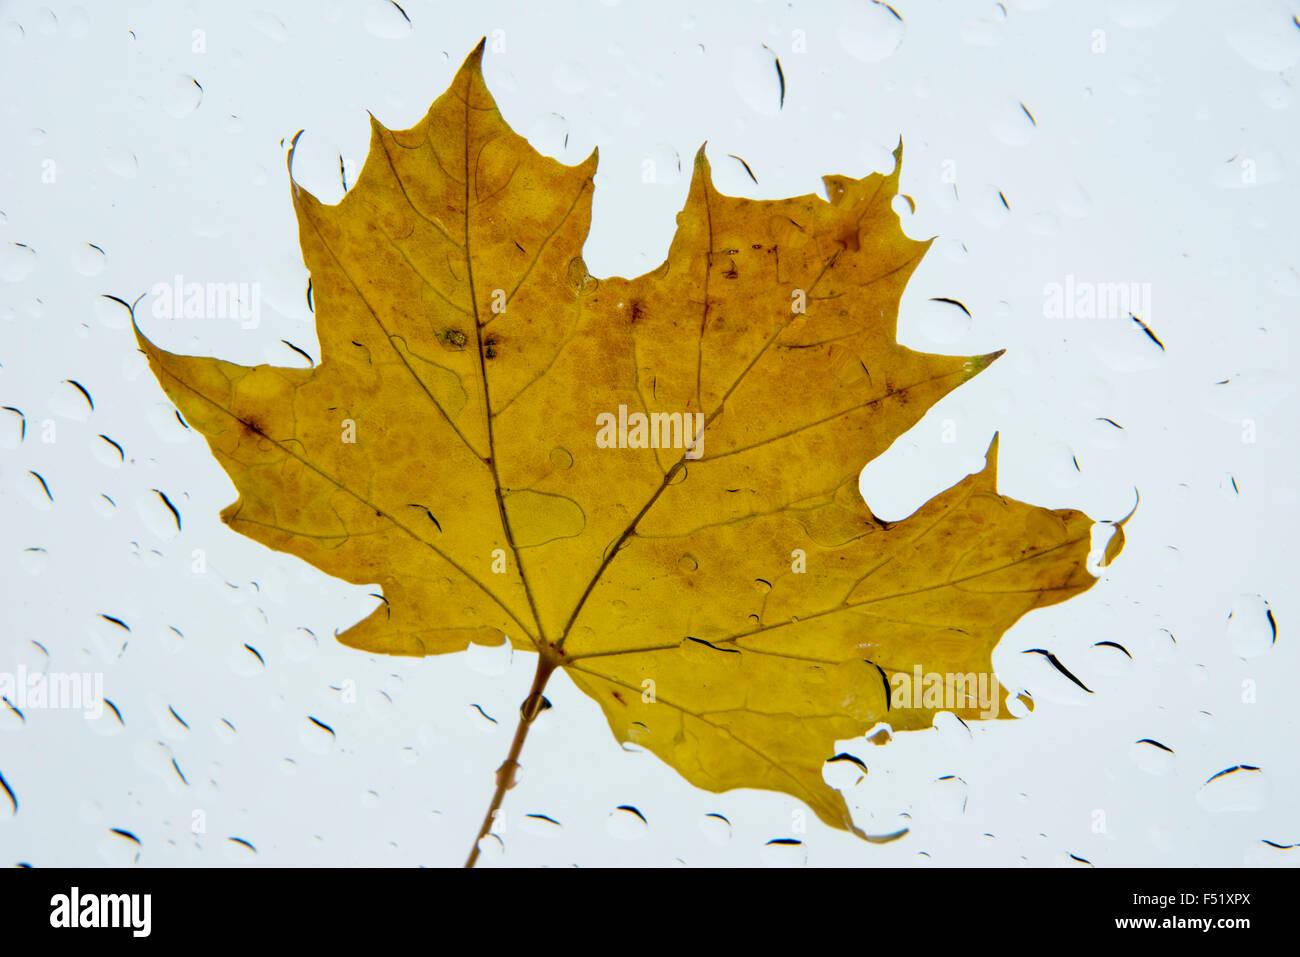 Maple leaf in the rain - Stock Image